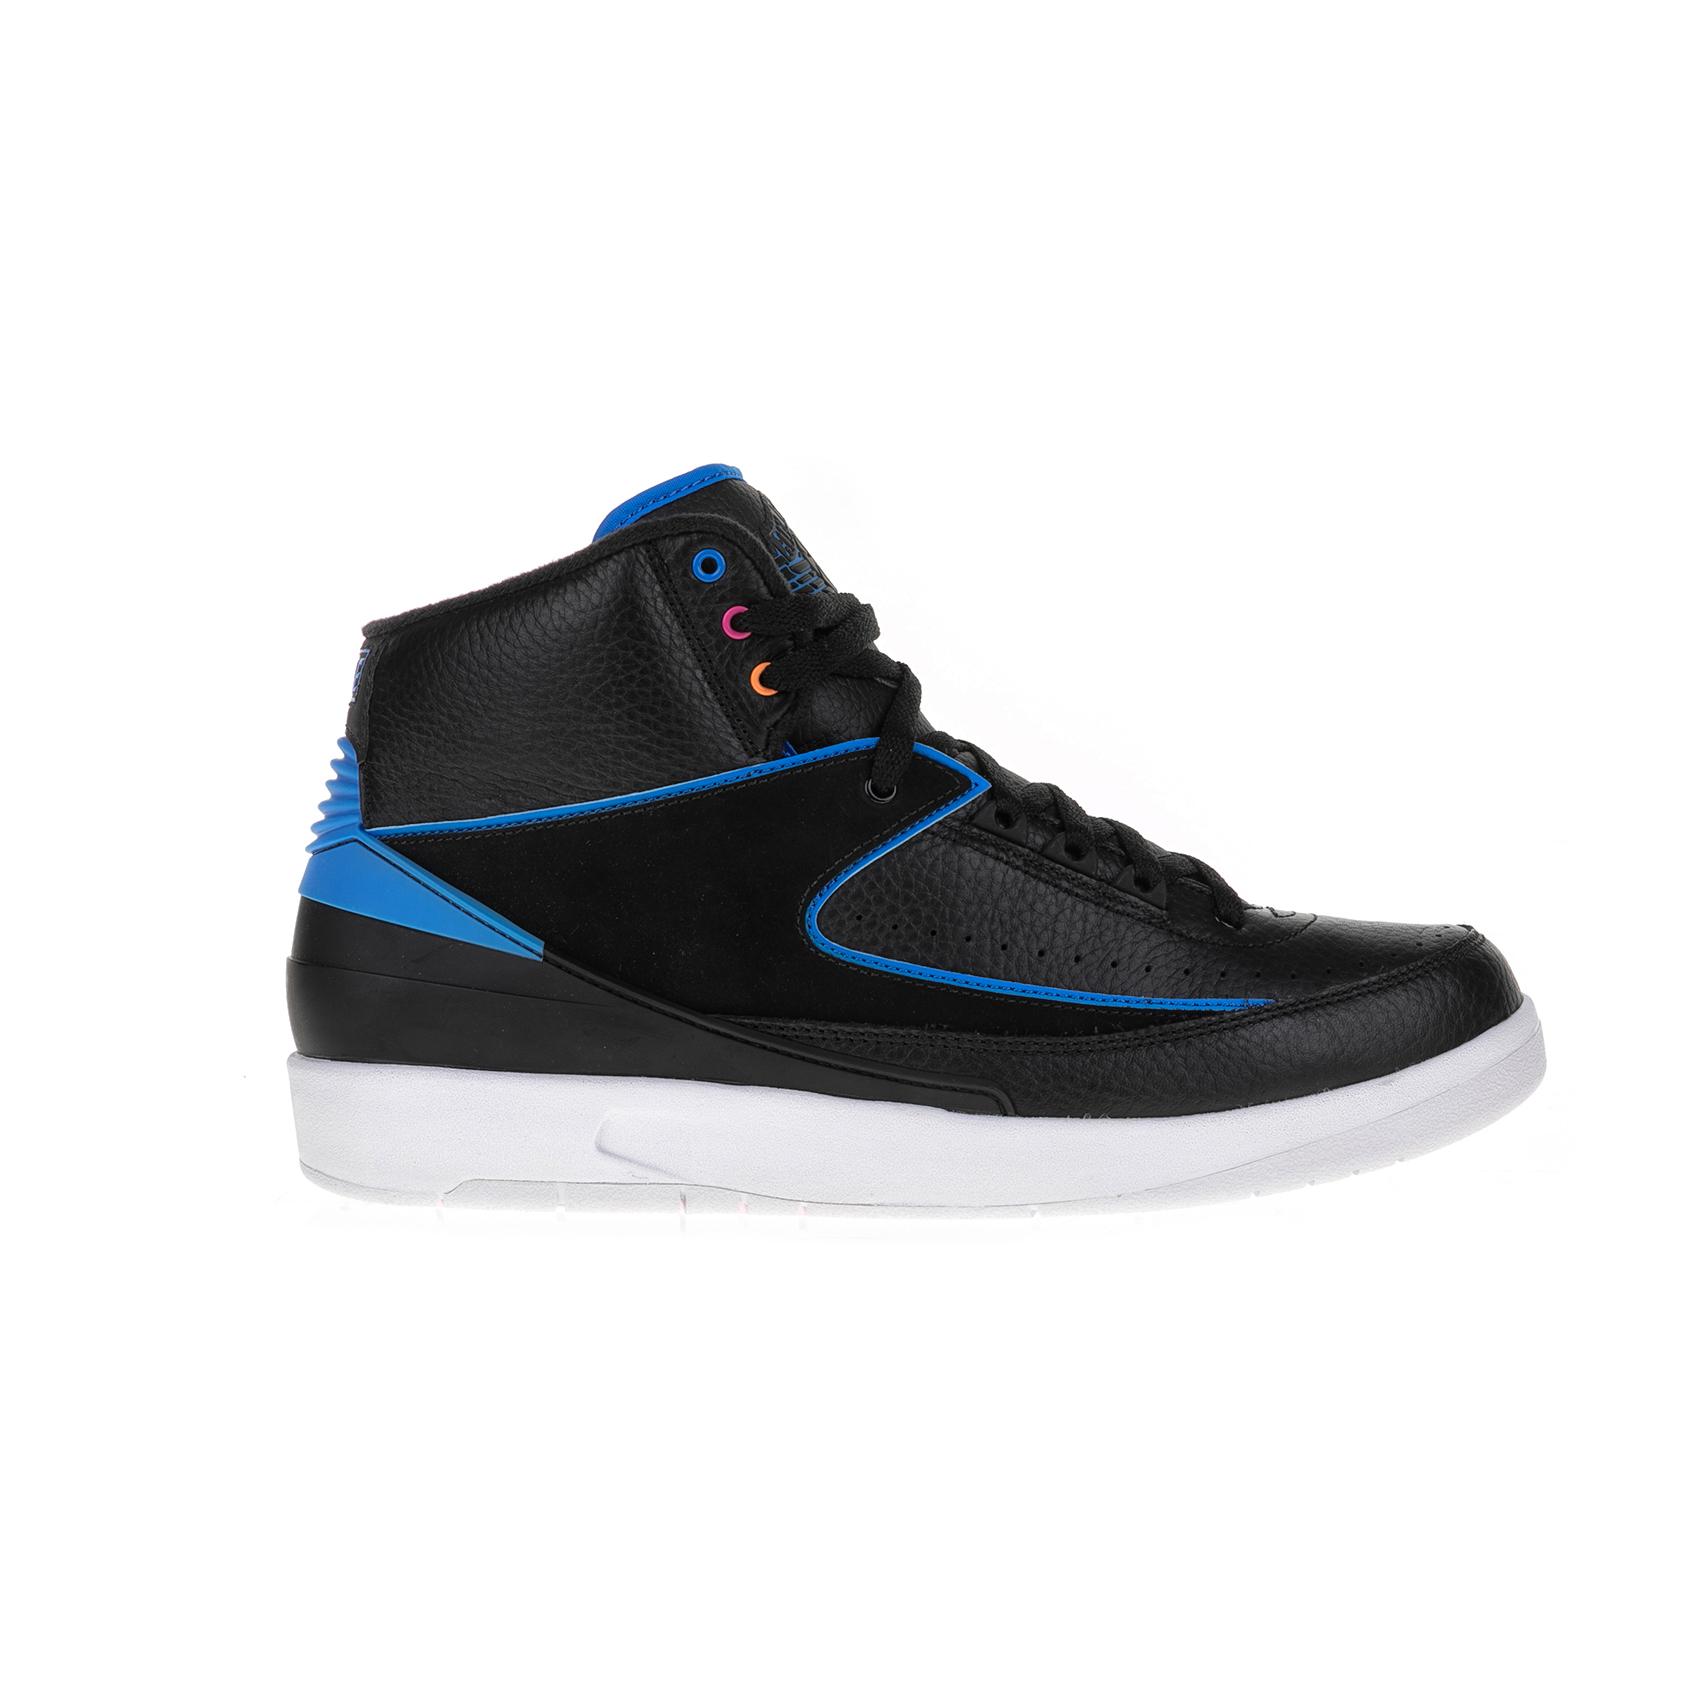 NIKE – Ανδρικά παπούτσια AIR JORDAN 2 RETRO μαύρα